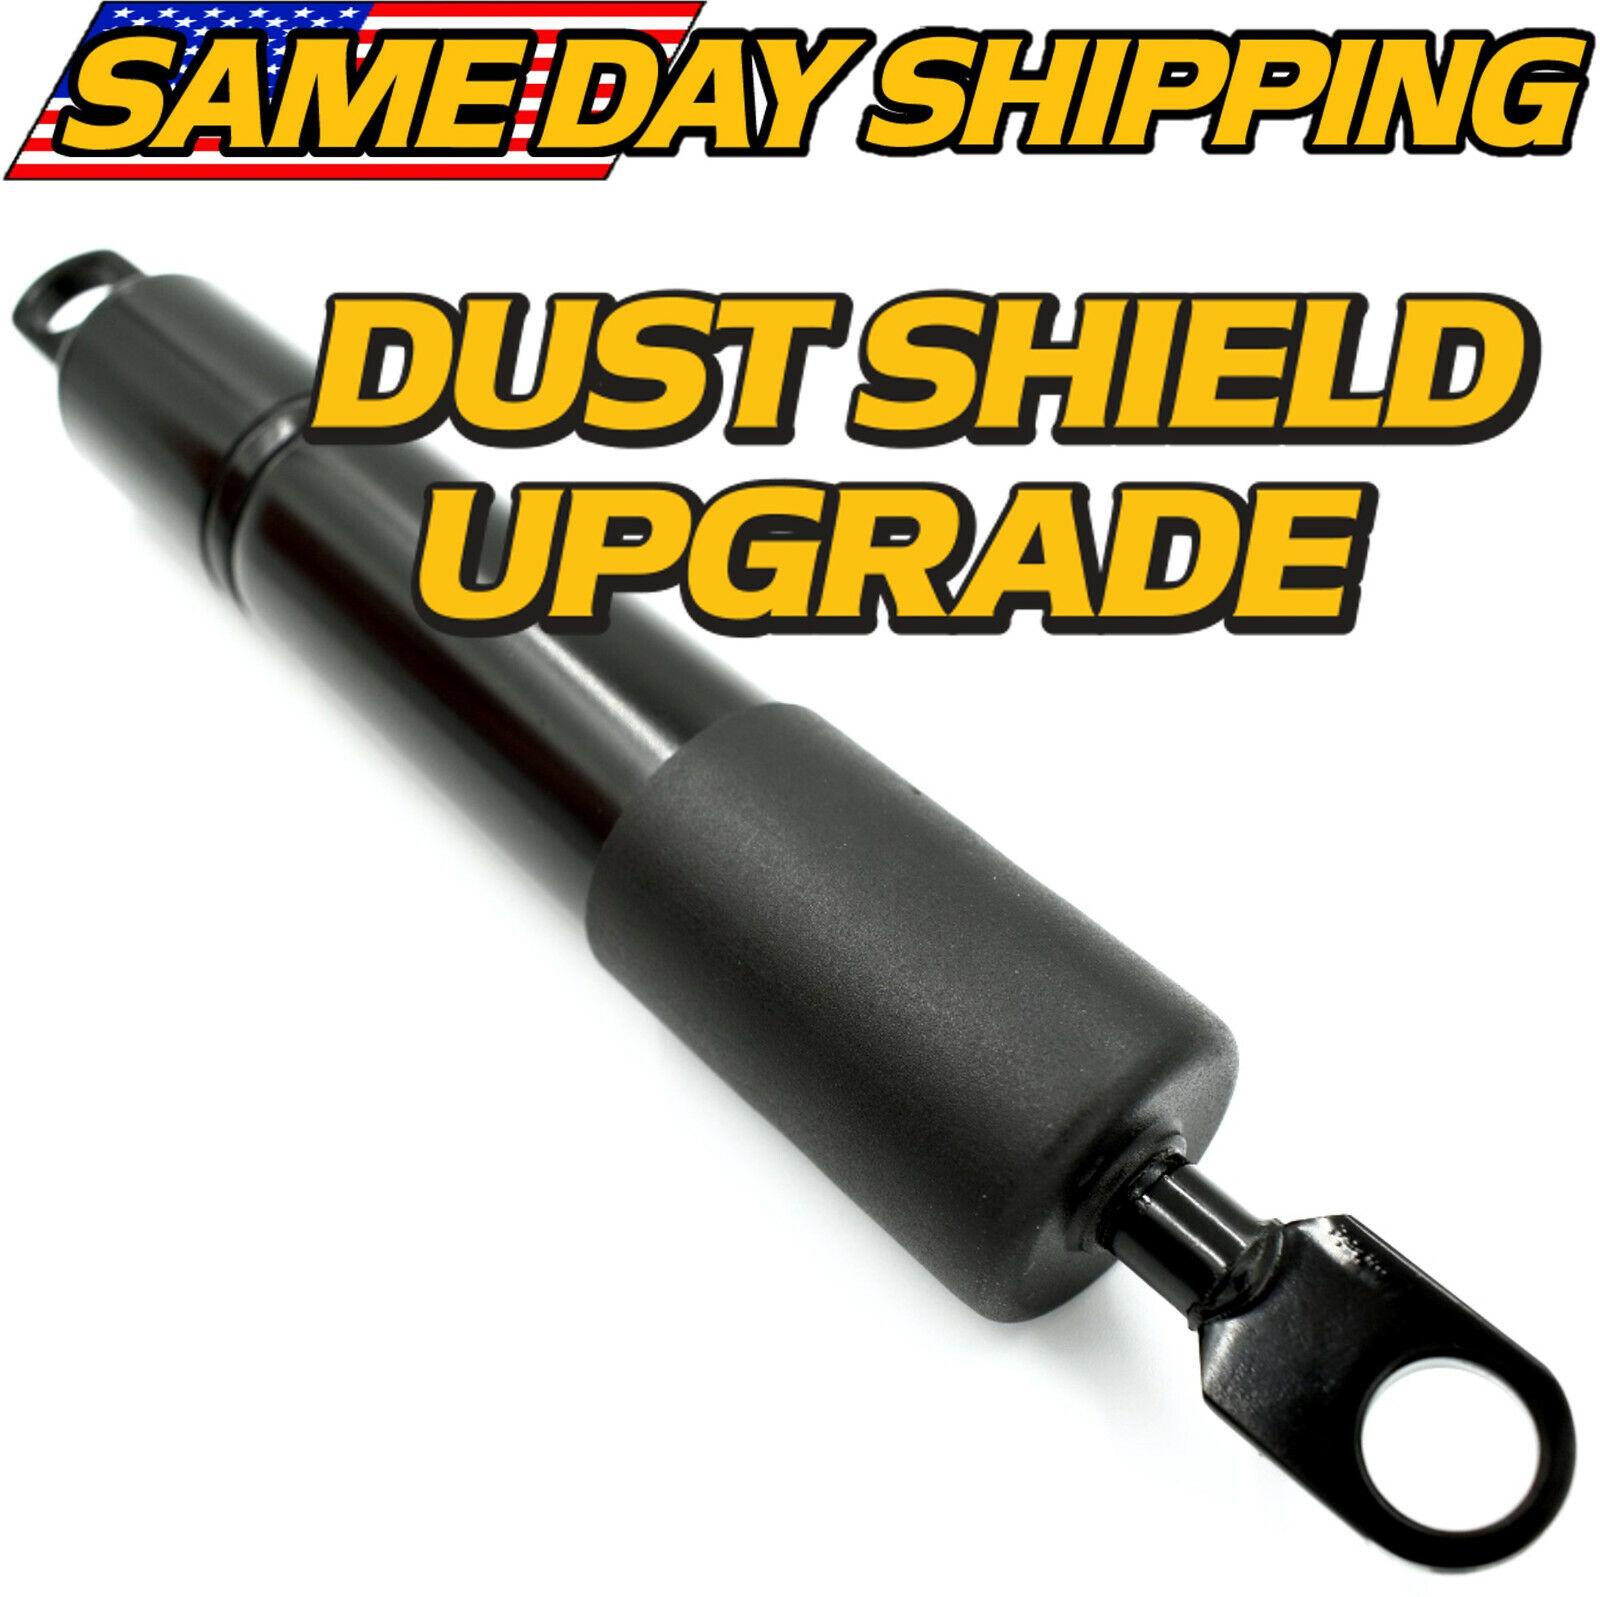 2 Pcs Shock Damper 109-2339 131-4132 103-2913 Replace Toro Lazer Z Exmark Kubota